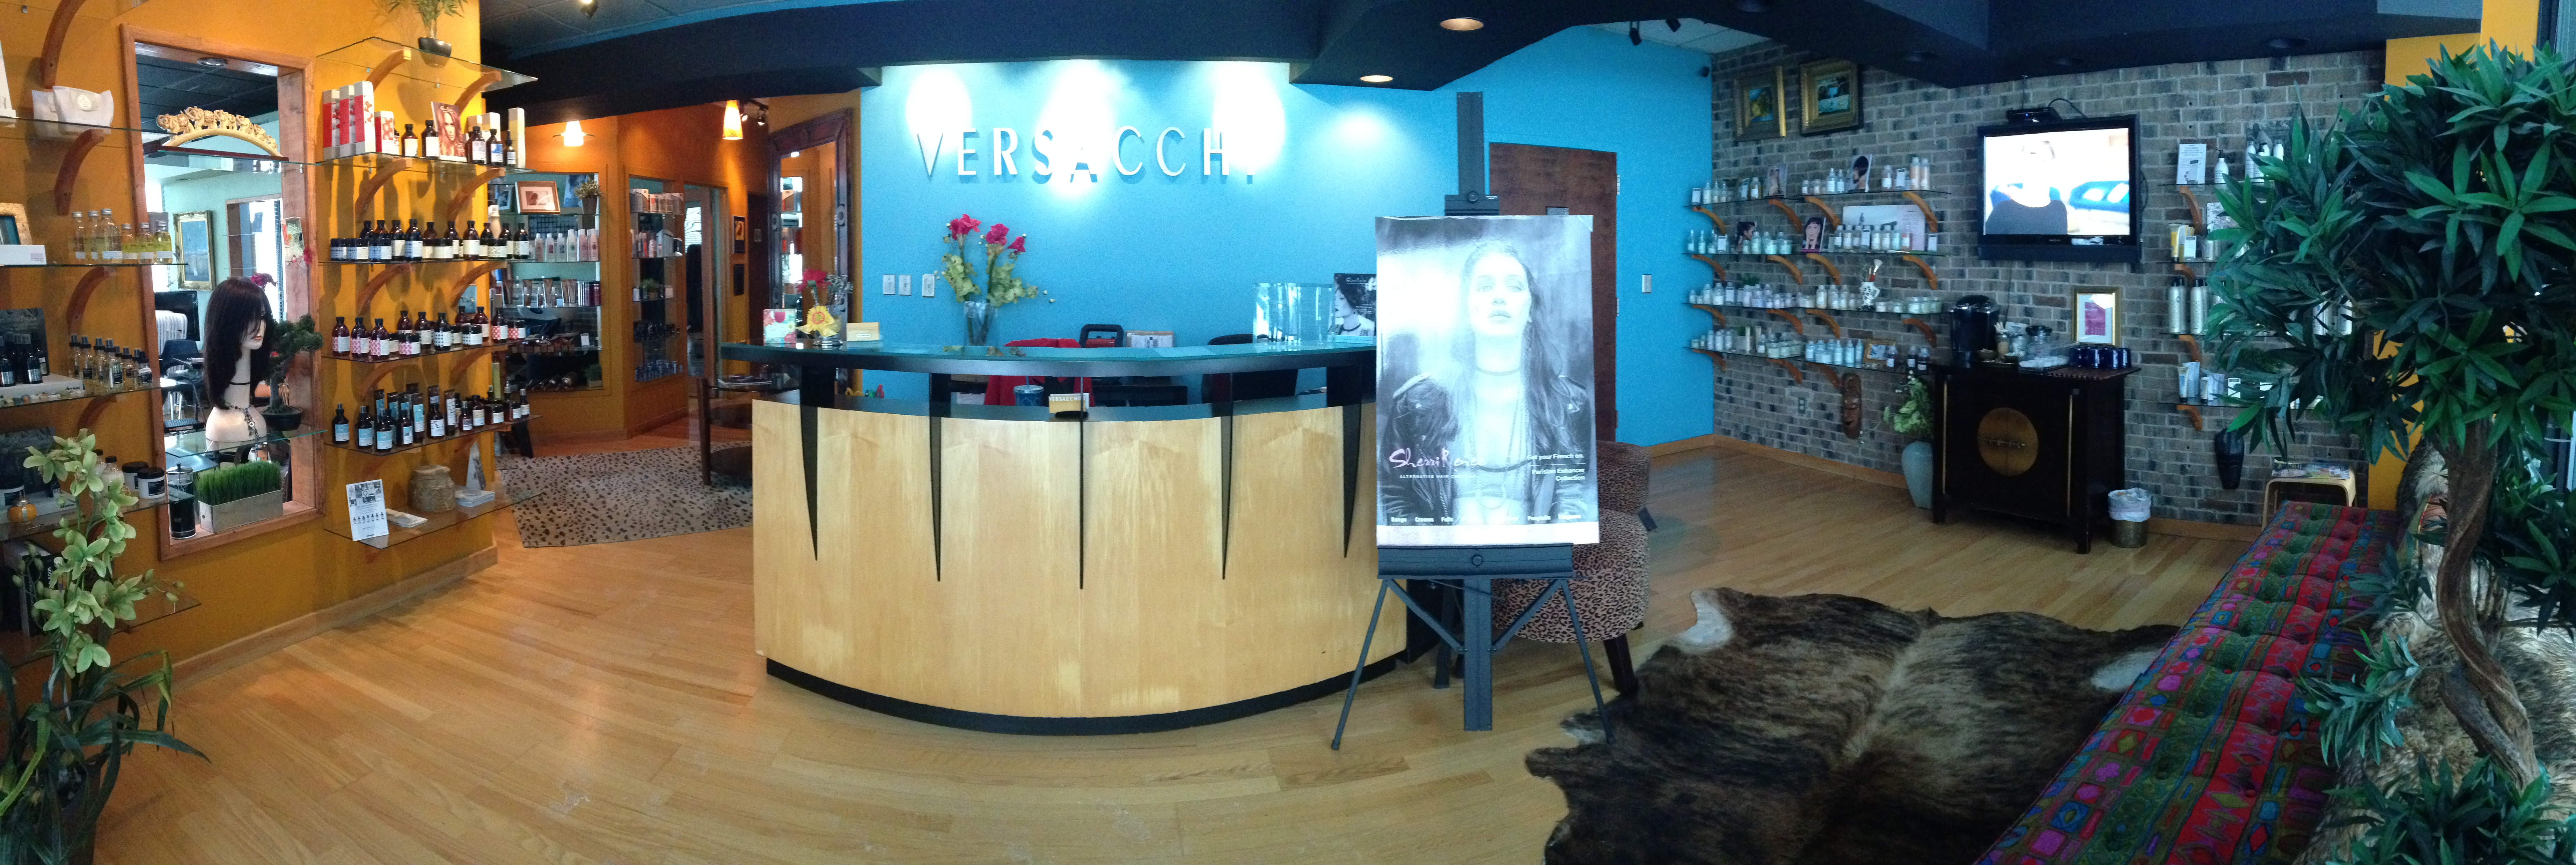 Versacchi Studios, Owings Mills MD